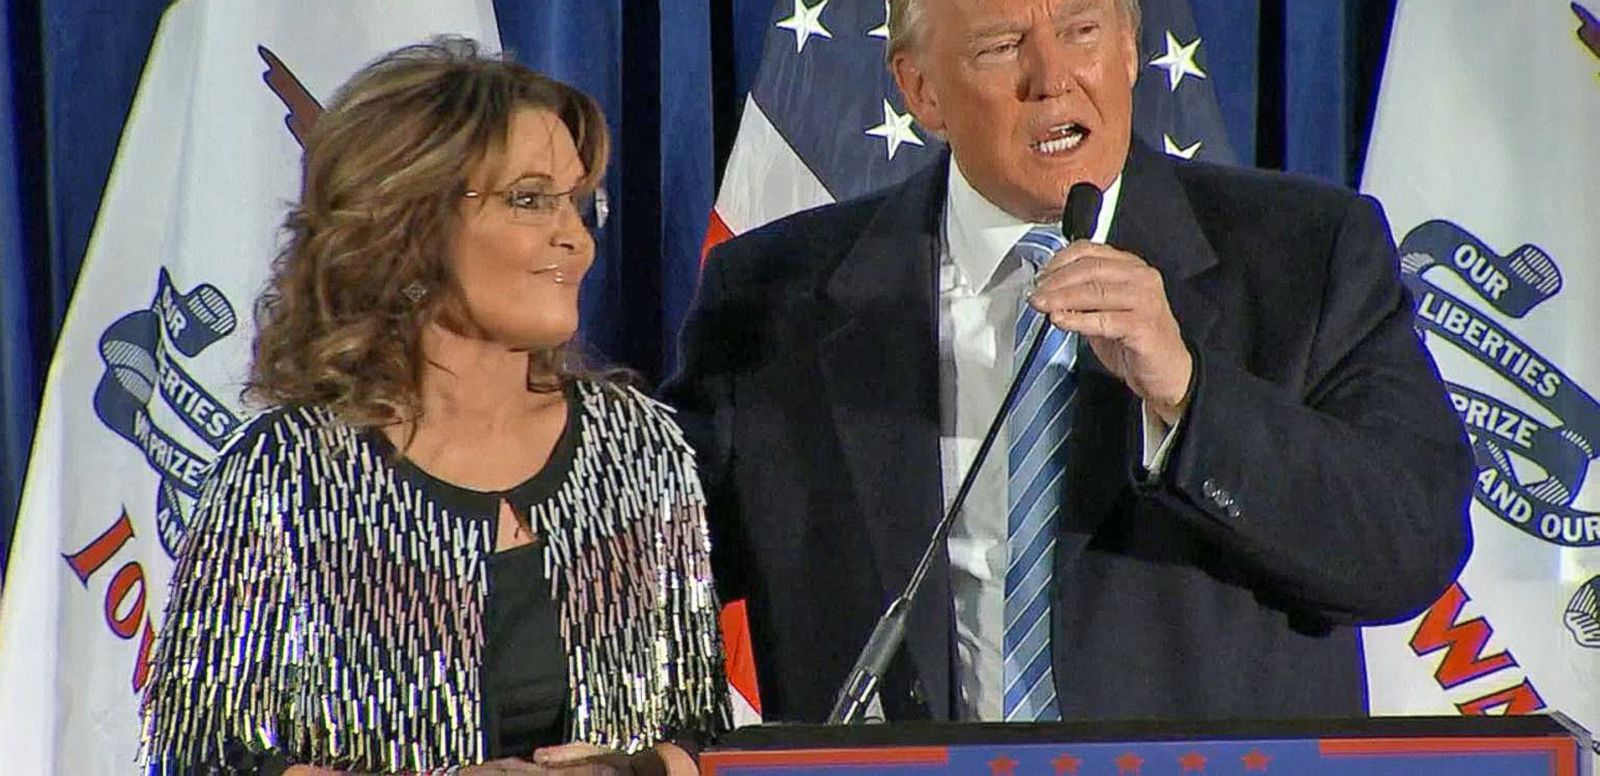 VIDEO: Sarah Palin Endorses Donald Trump for President